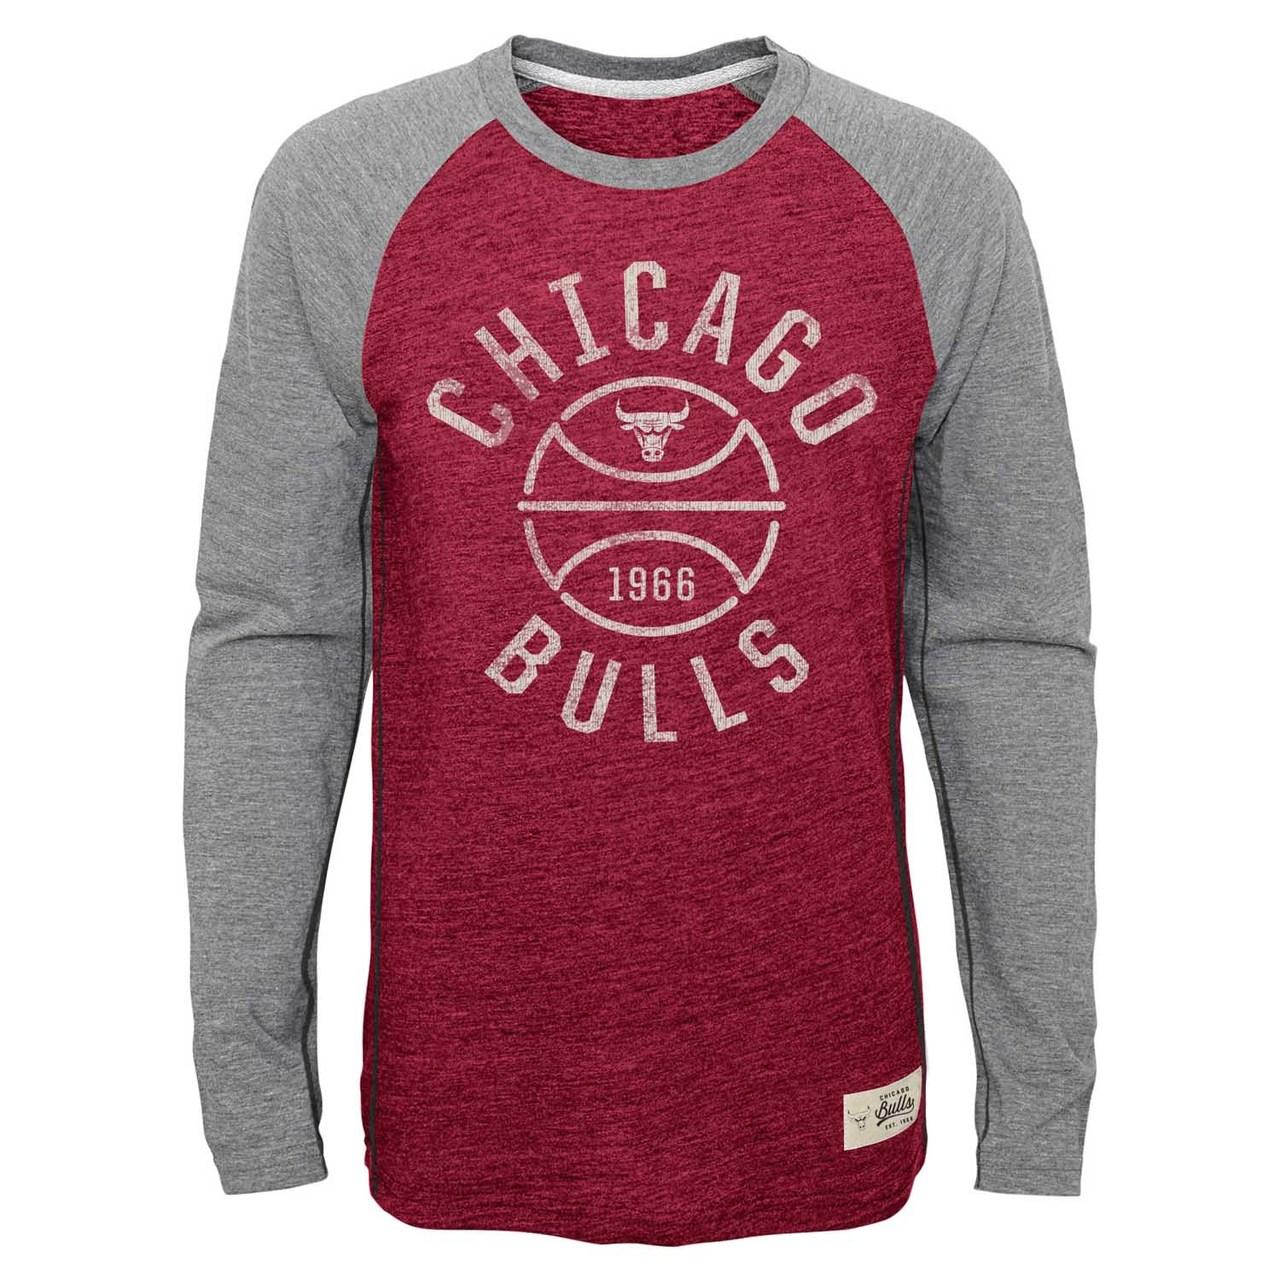 Chicago Bulls Youth NBA Basketball Roots Raglan Long Sleeve Shirt  - Red